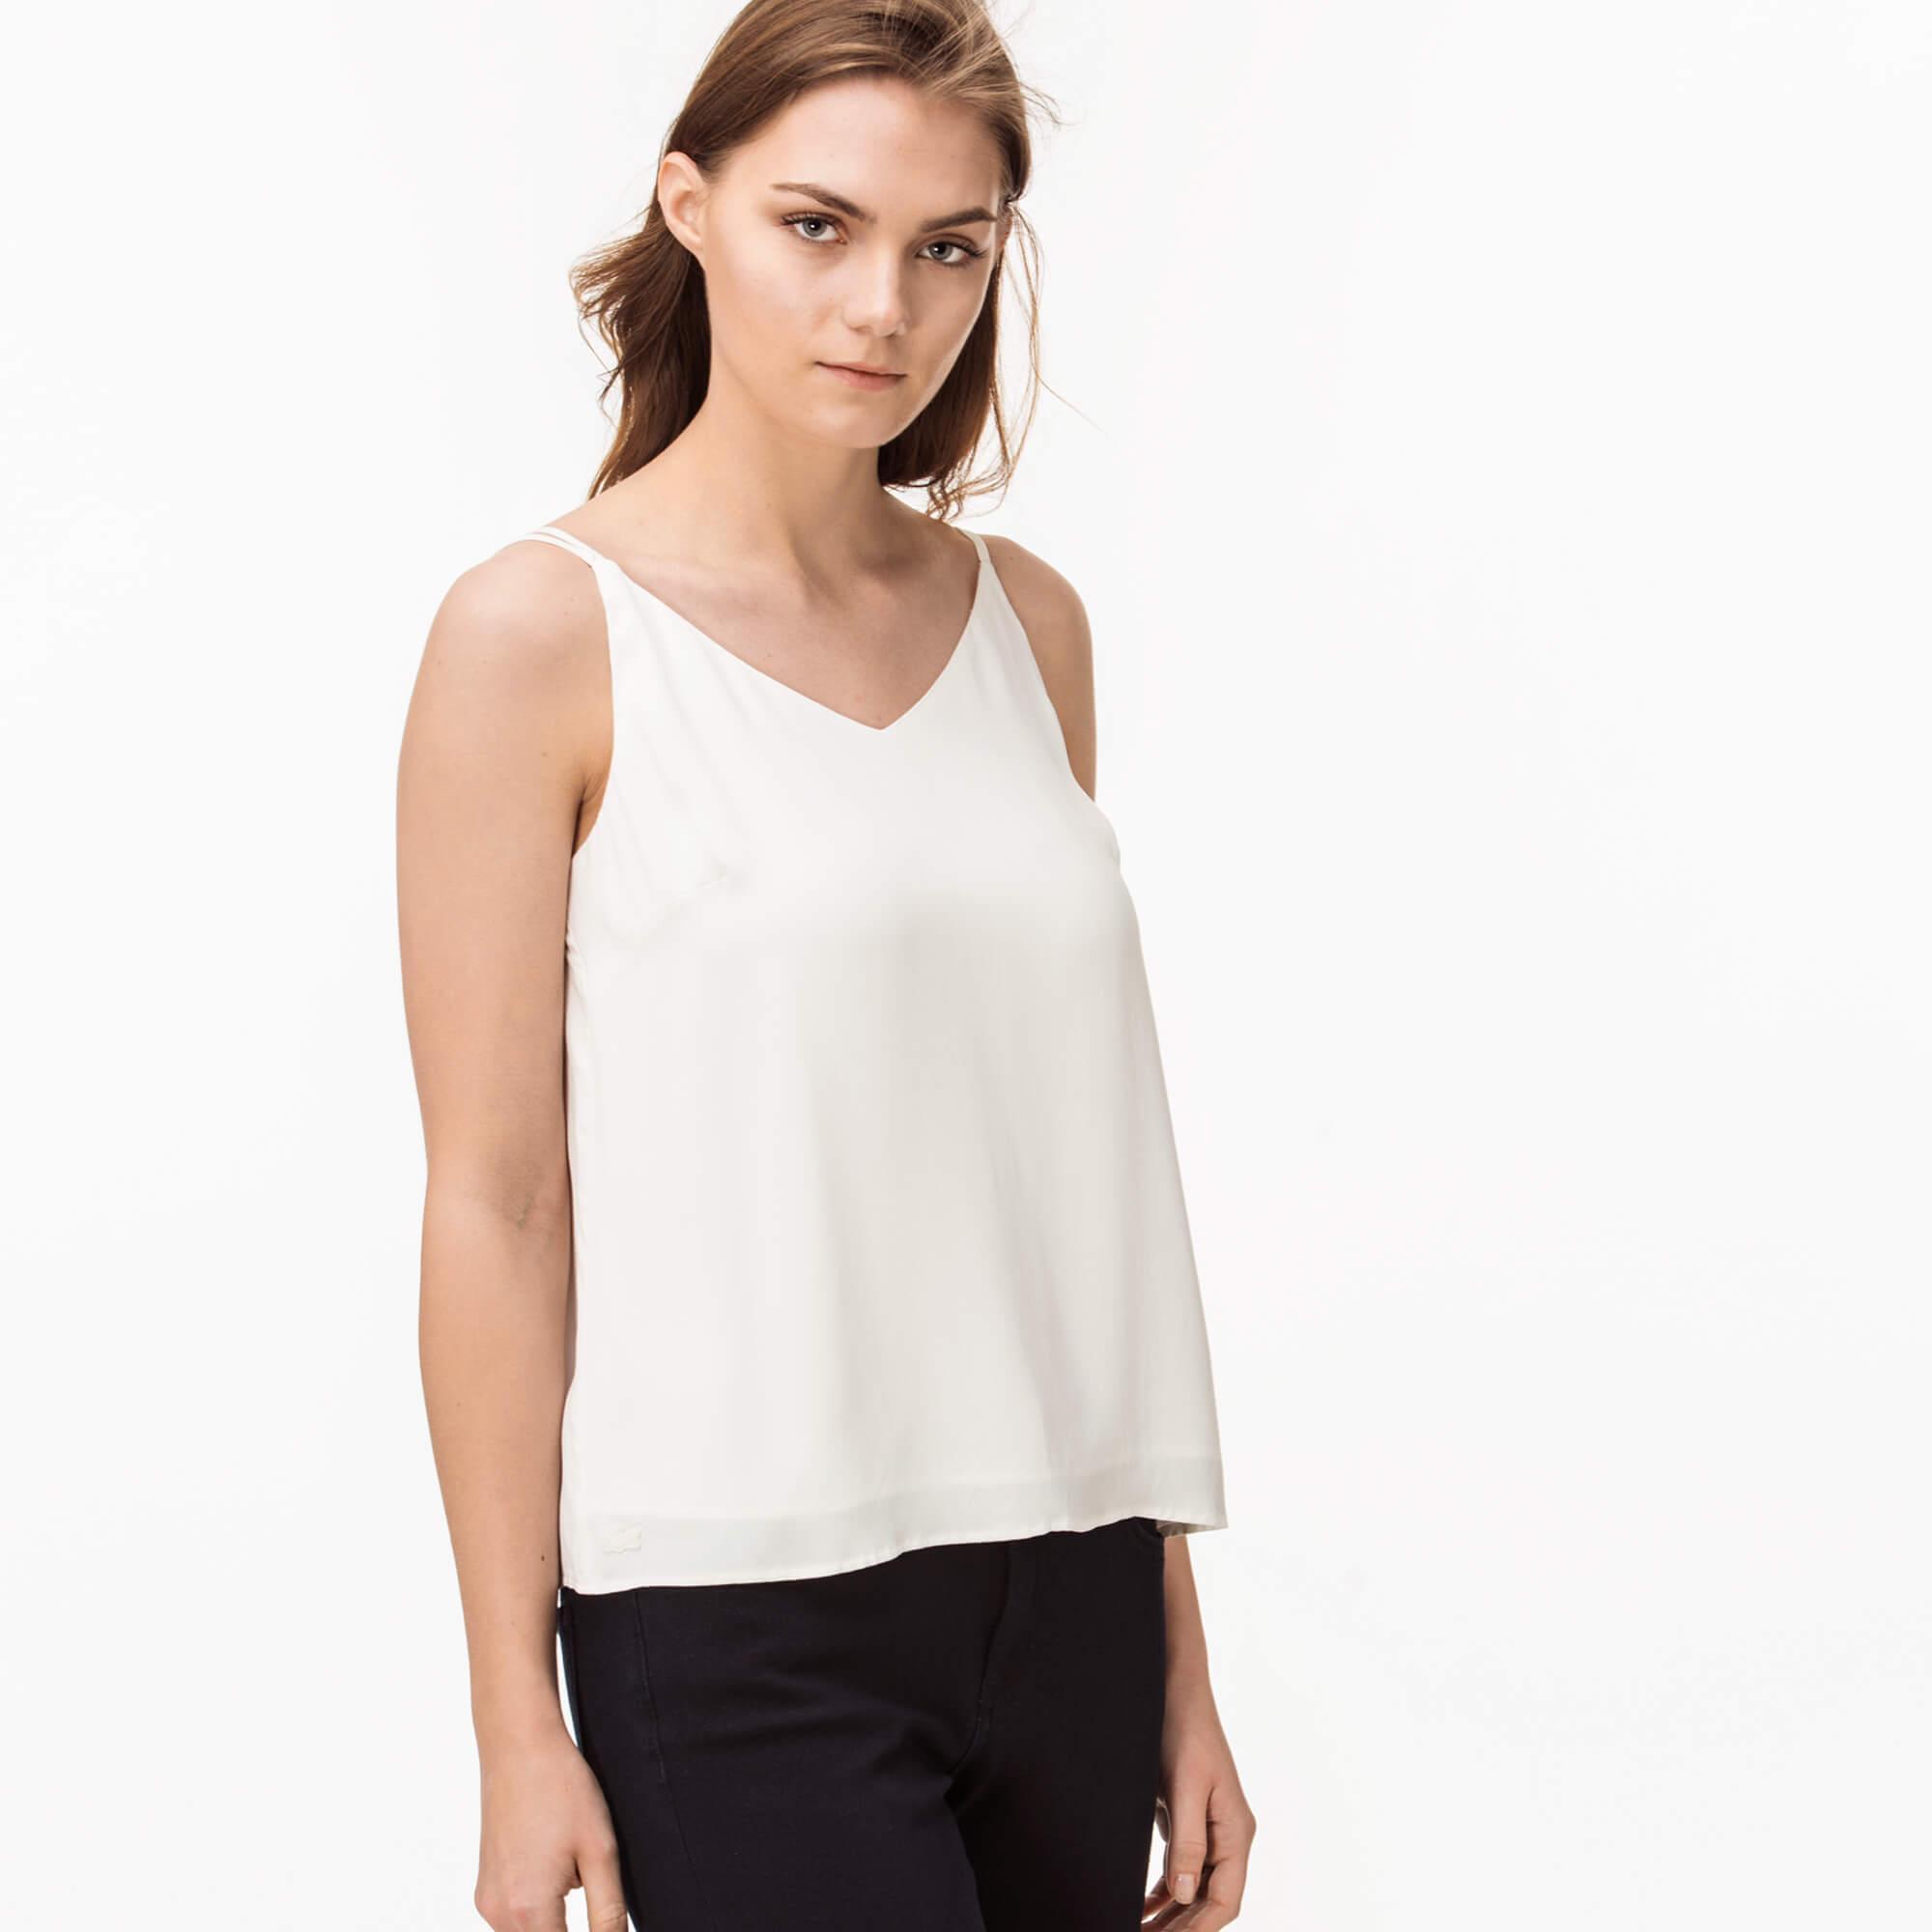 Lacoste блузка жіноча